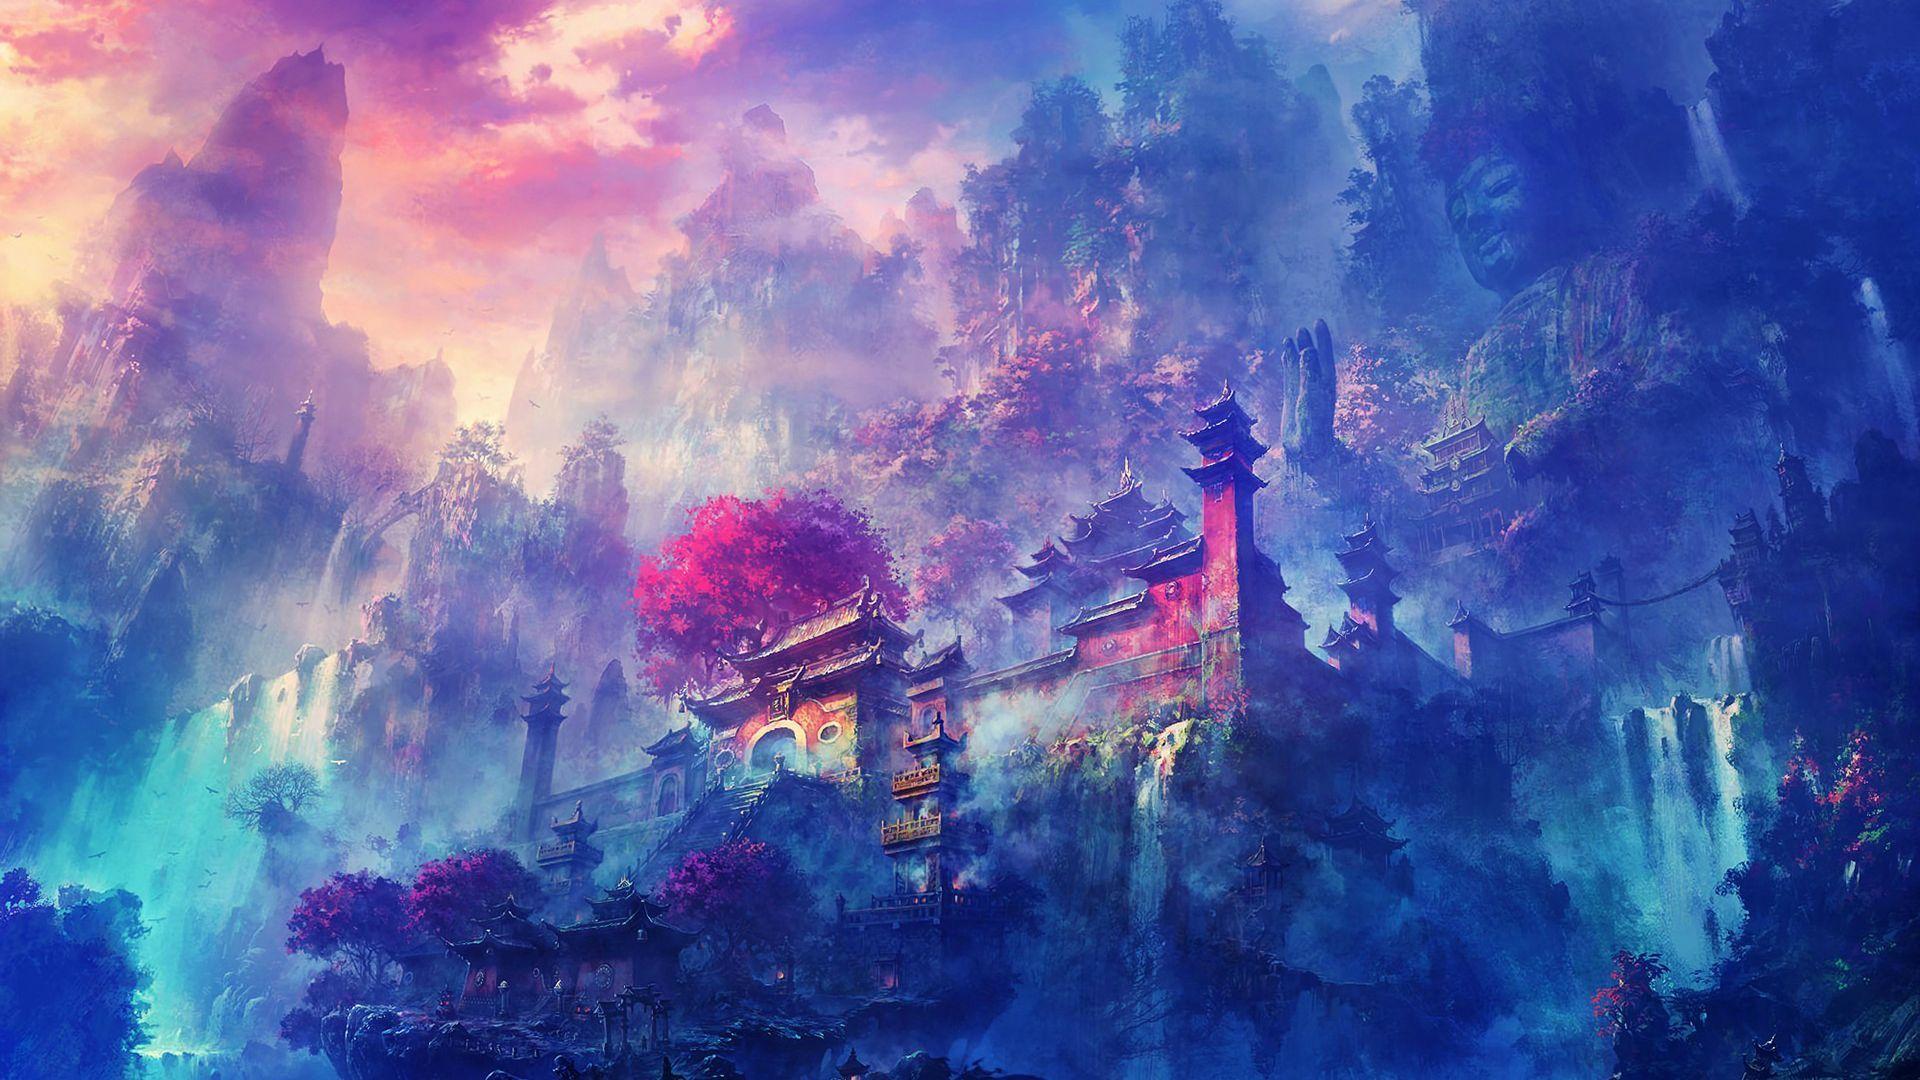 Hidden Temple 1920 X 1080 Anime Scenery Anime Wallpaper Hd Anime Wallpapers Desktop wallpaper anime art